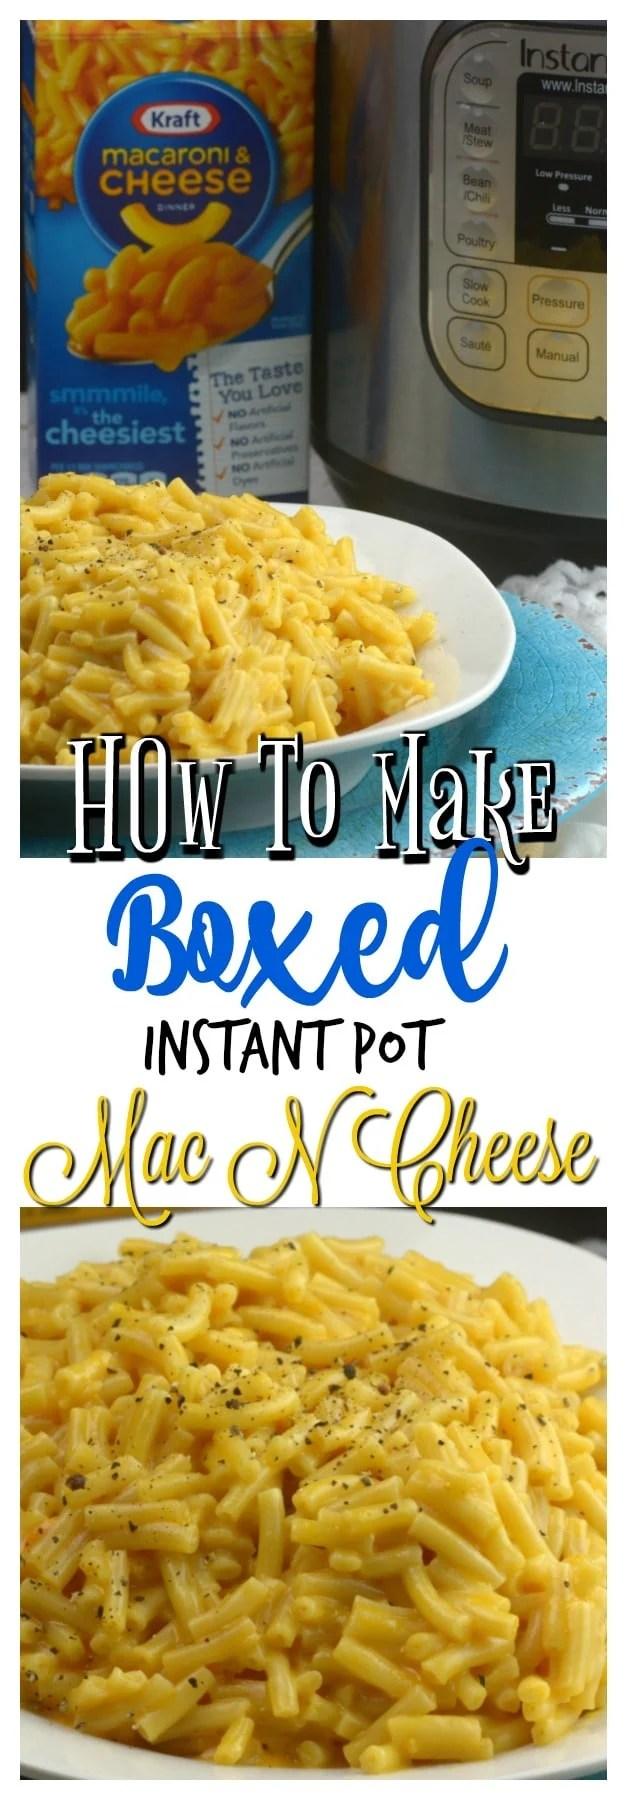 make instant pot boxed mac n cheese